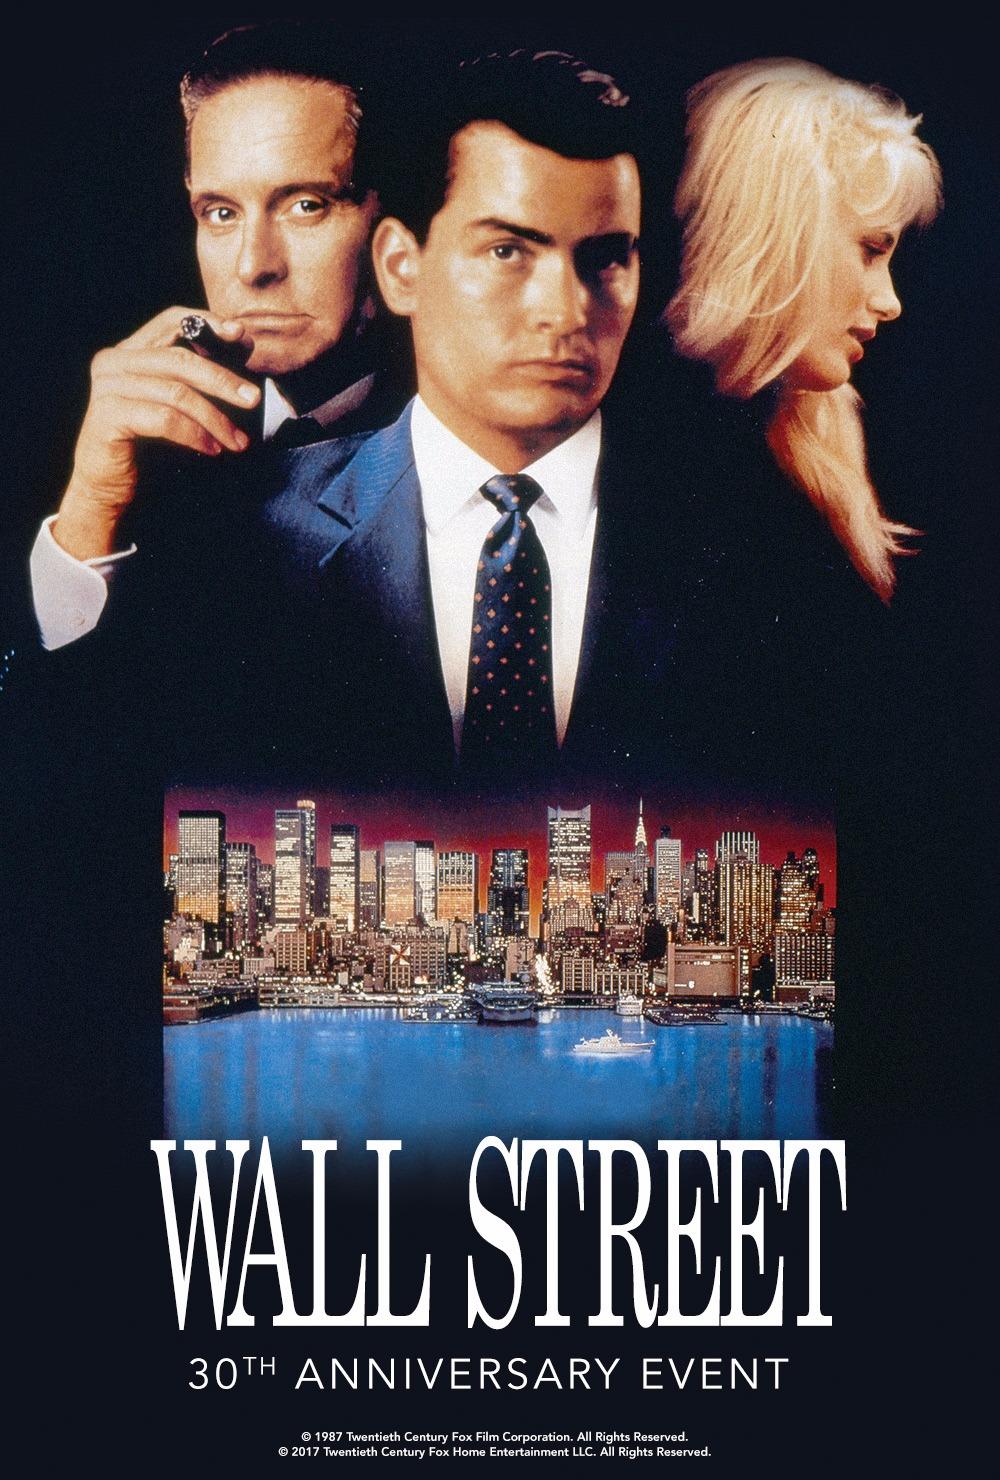 Wall Street 30th Anniversary